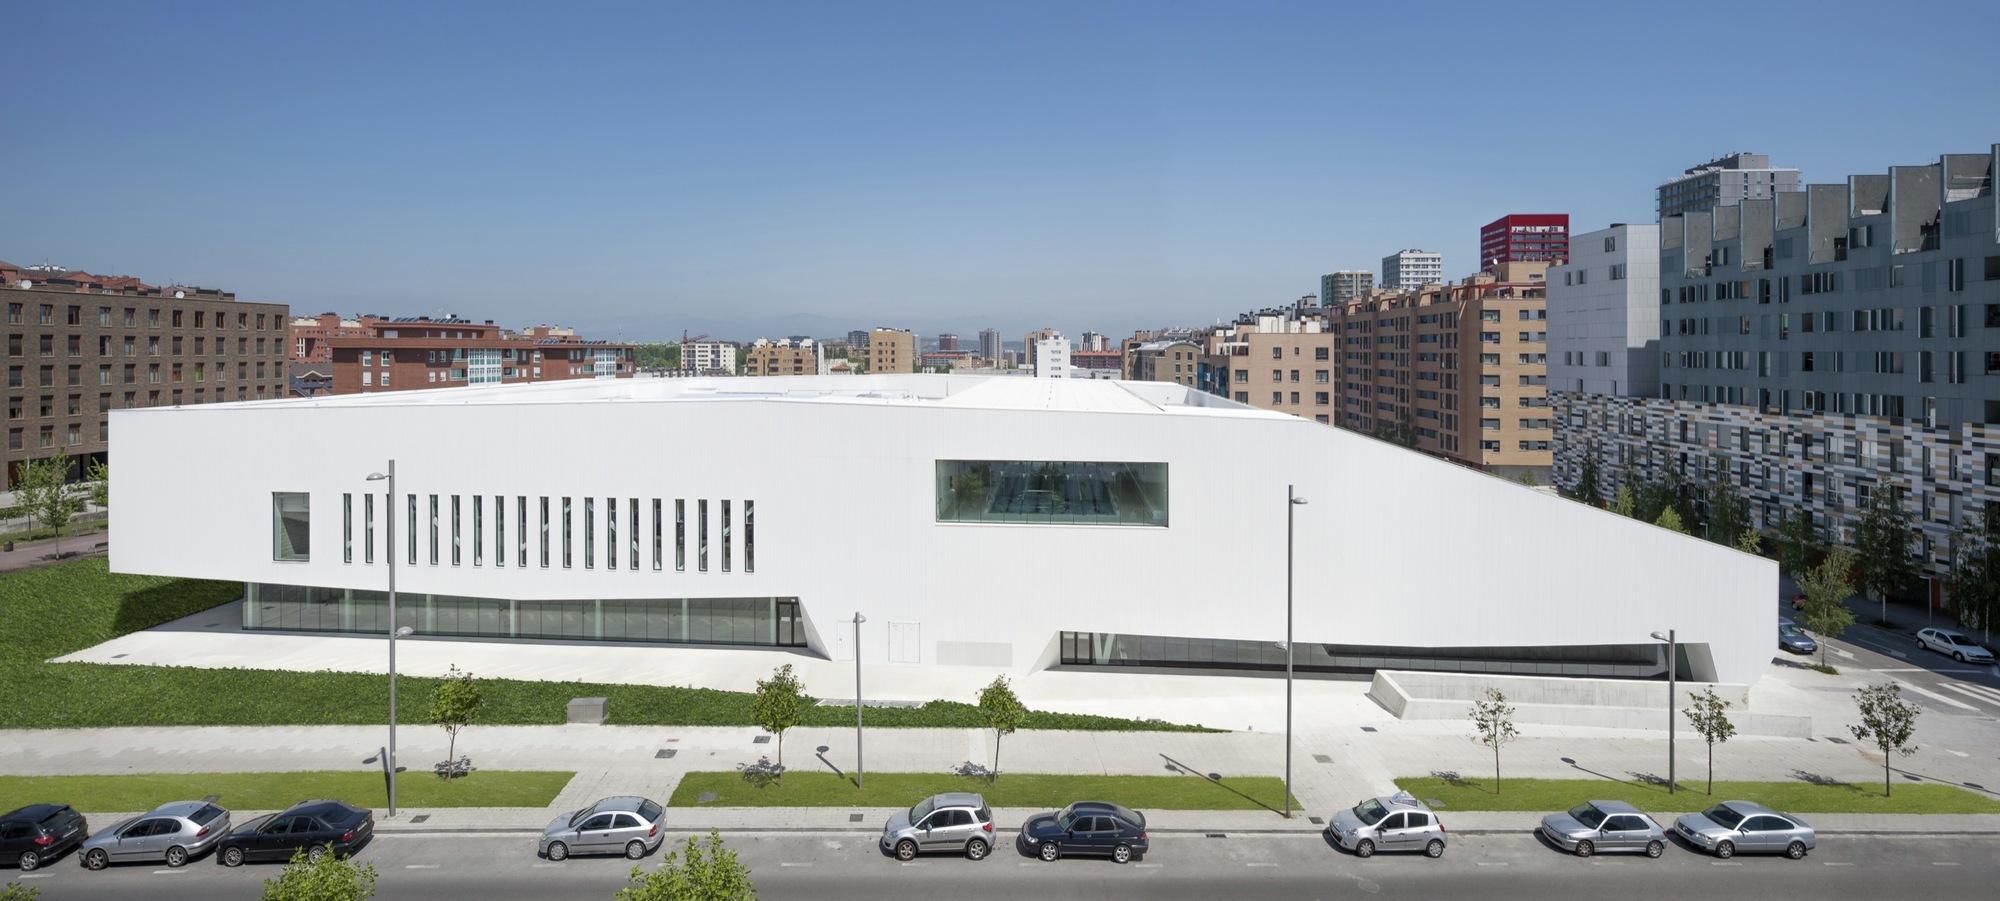 salburua civic center    acxt